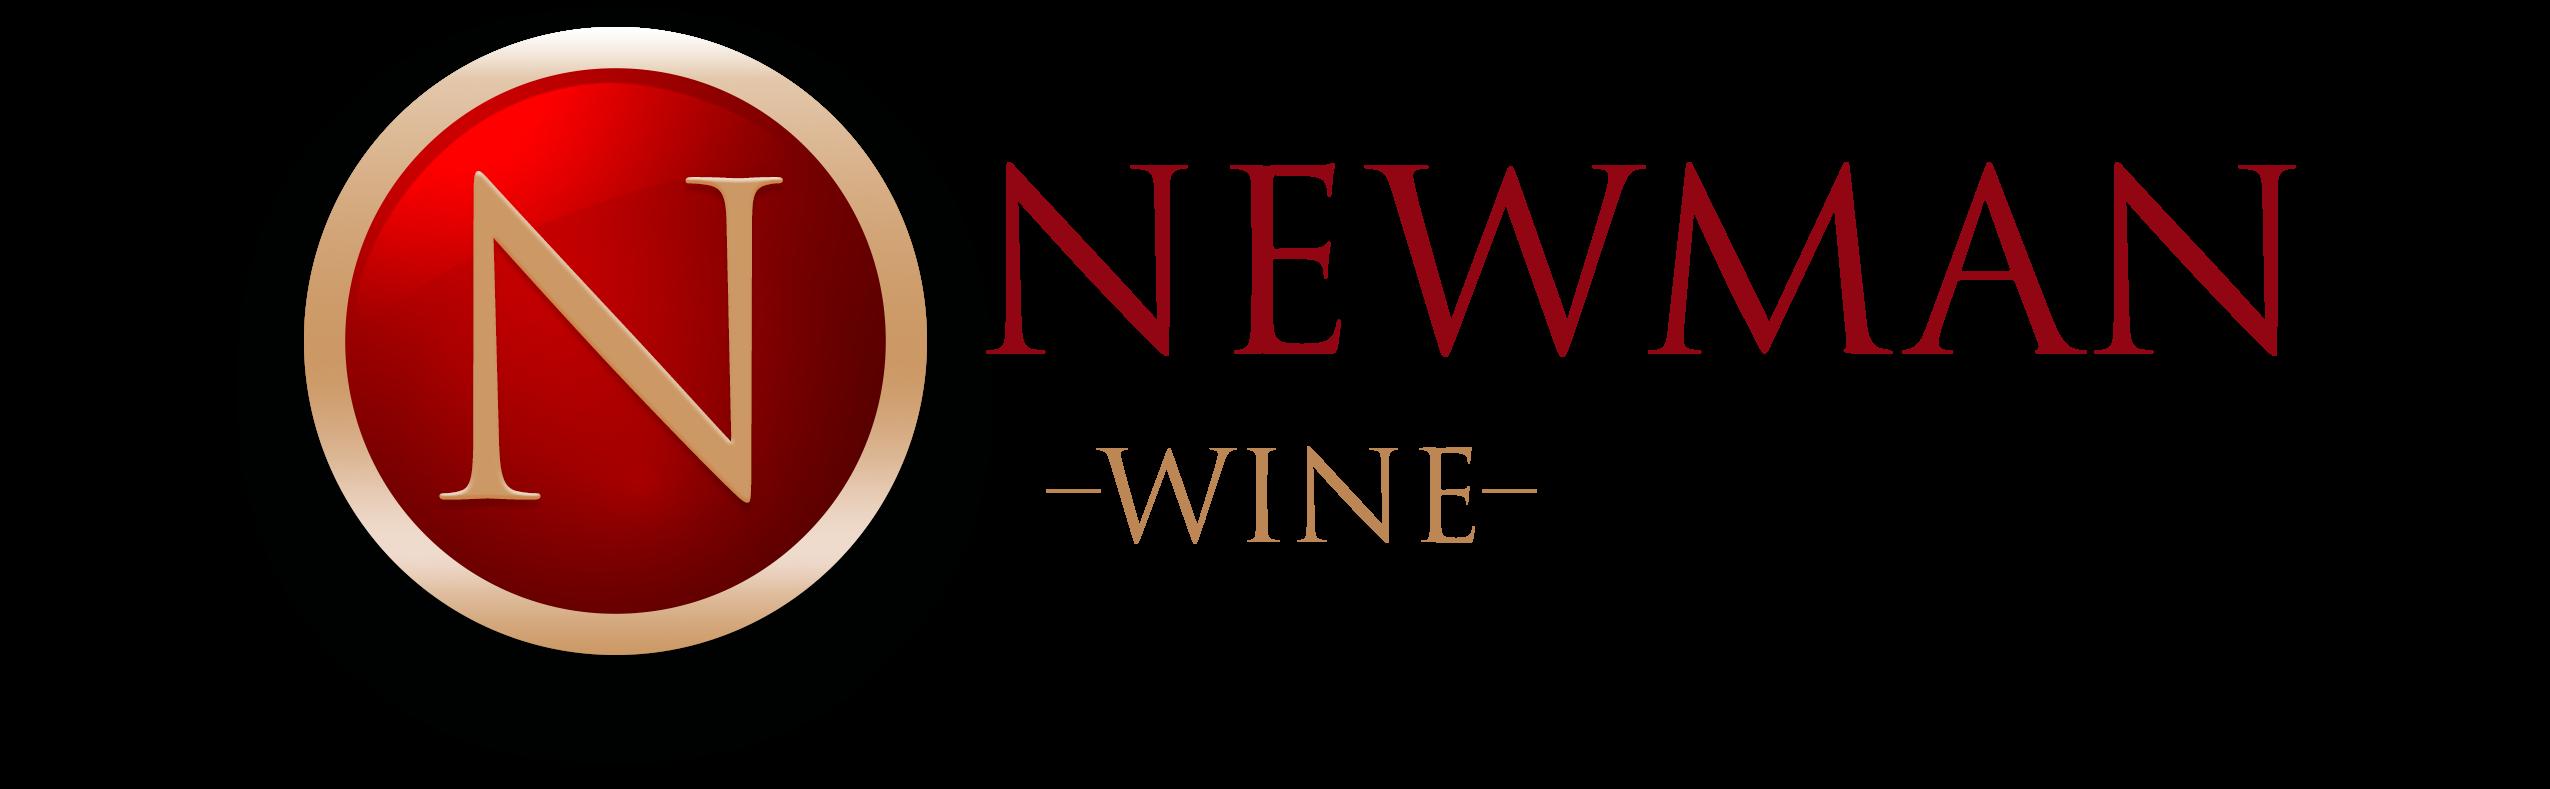 Newman Wine